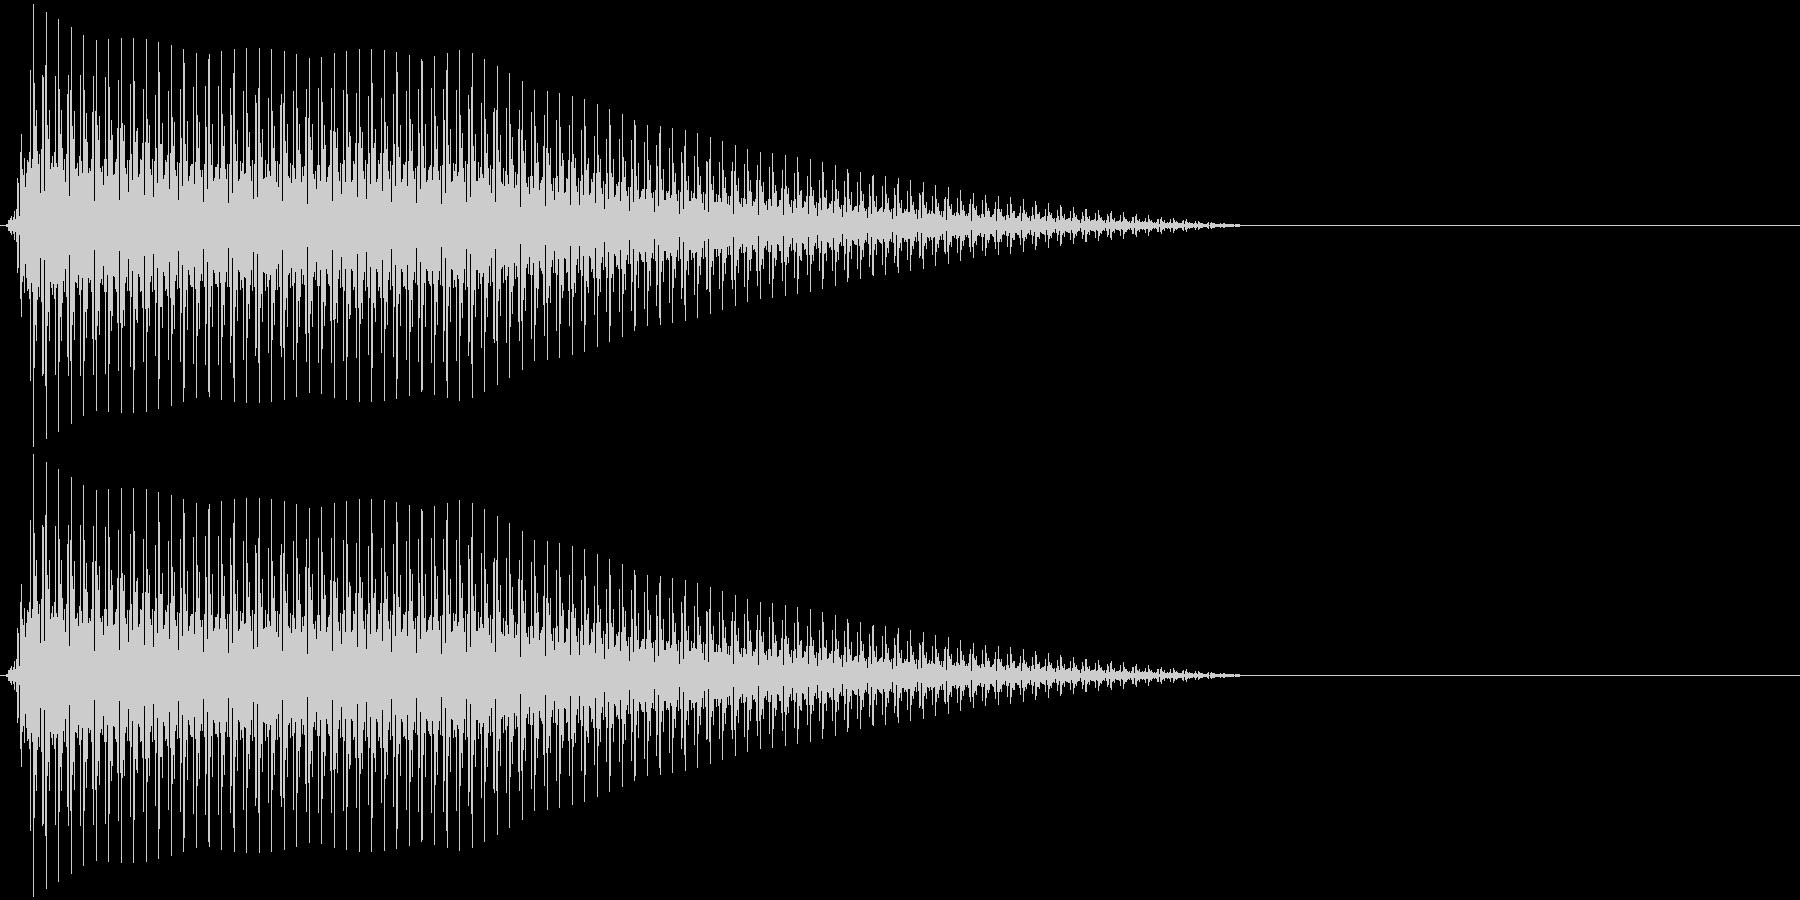 OctaveCom アプリ用タッチ音10の未再生の波形